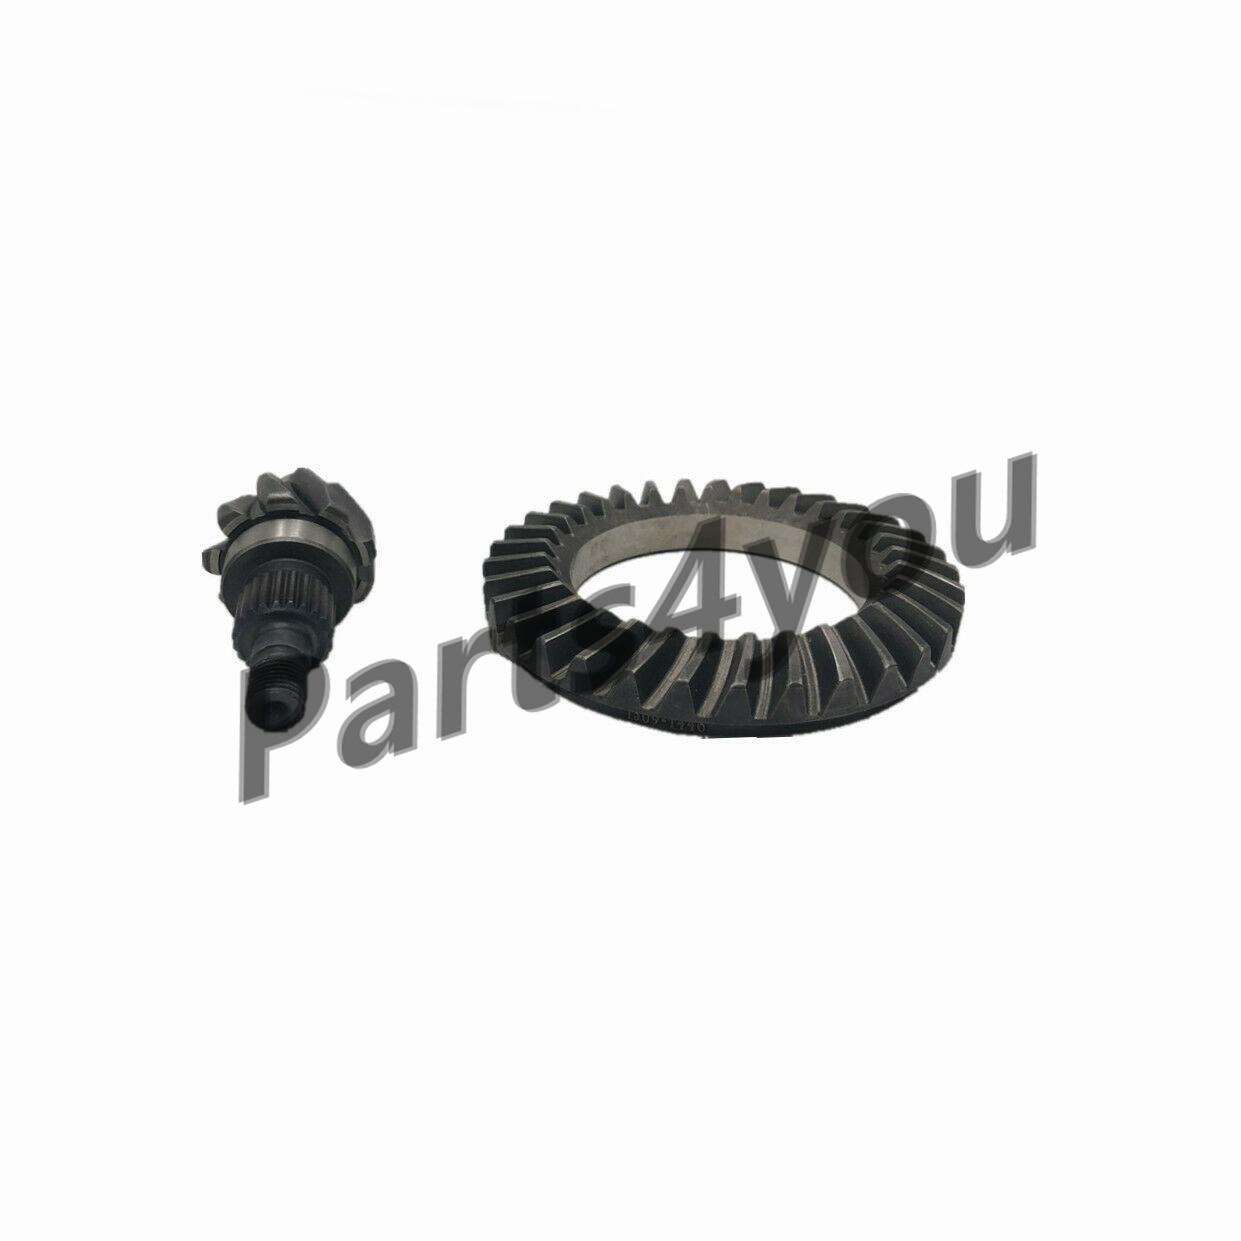 Drive Pinion Gear Differential Gear for CFmoto ATV UTV  CF400 CF500 X5 CF500 CForce 520 550 CF800 800 CF62 X6 U6 0180-310020 enlarge